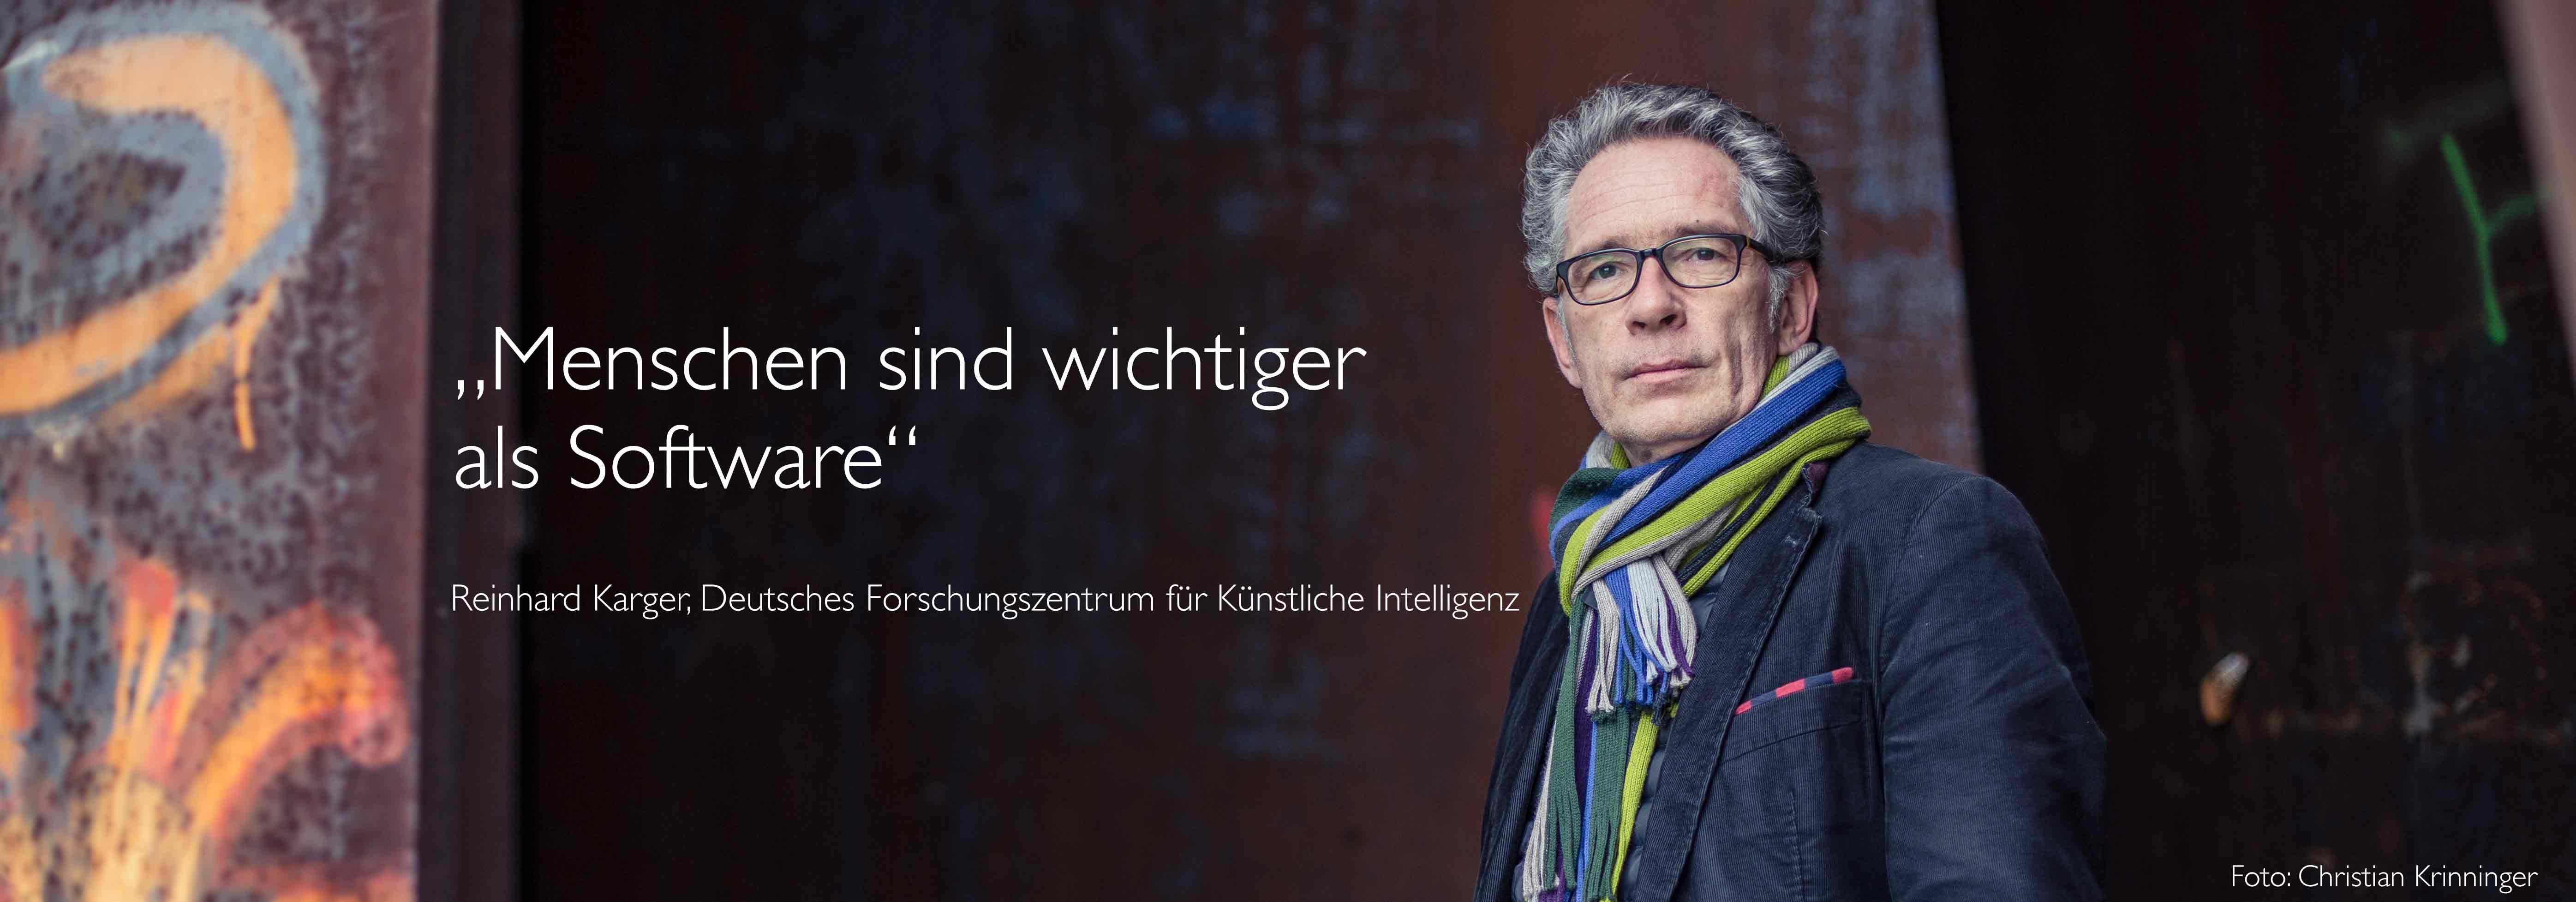 Reinhard Karger Social Bots Influencer Kommunikation